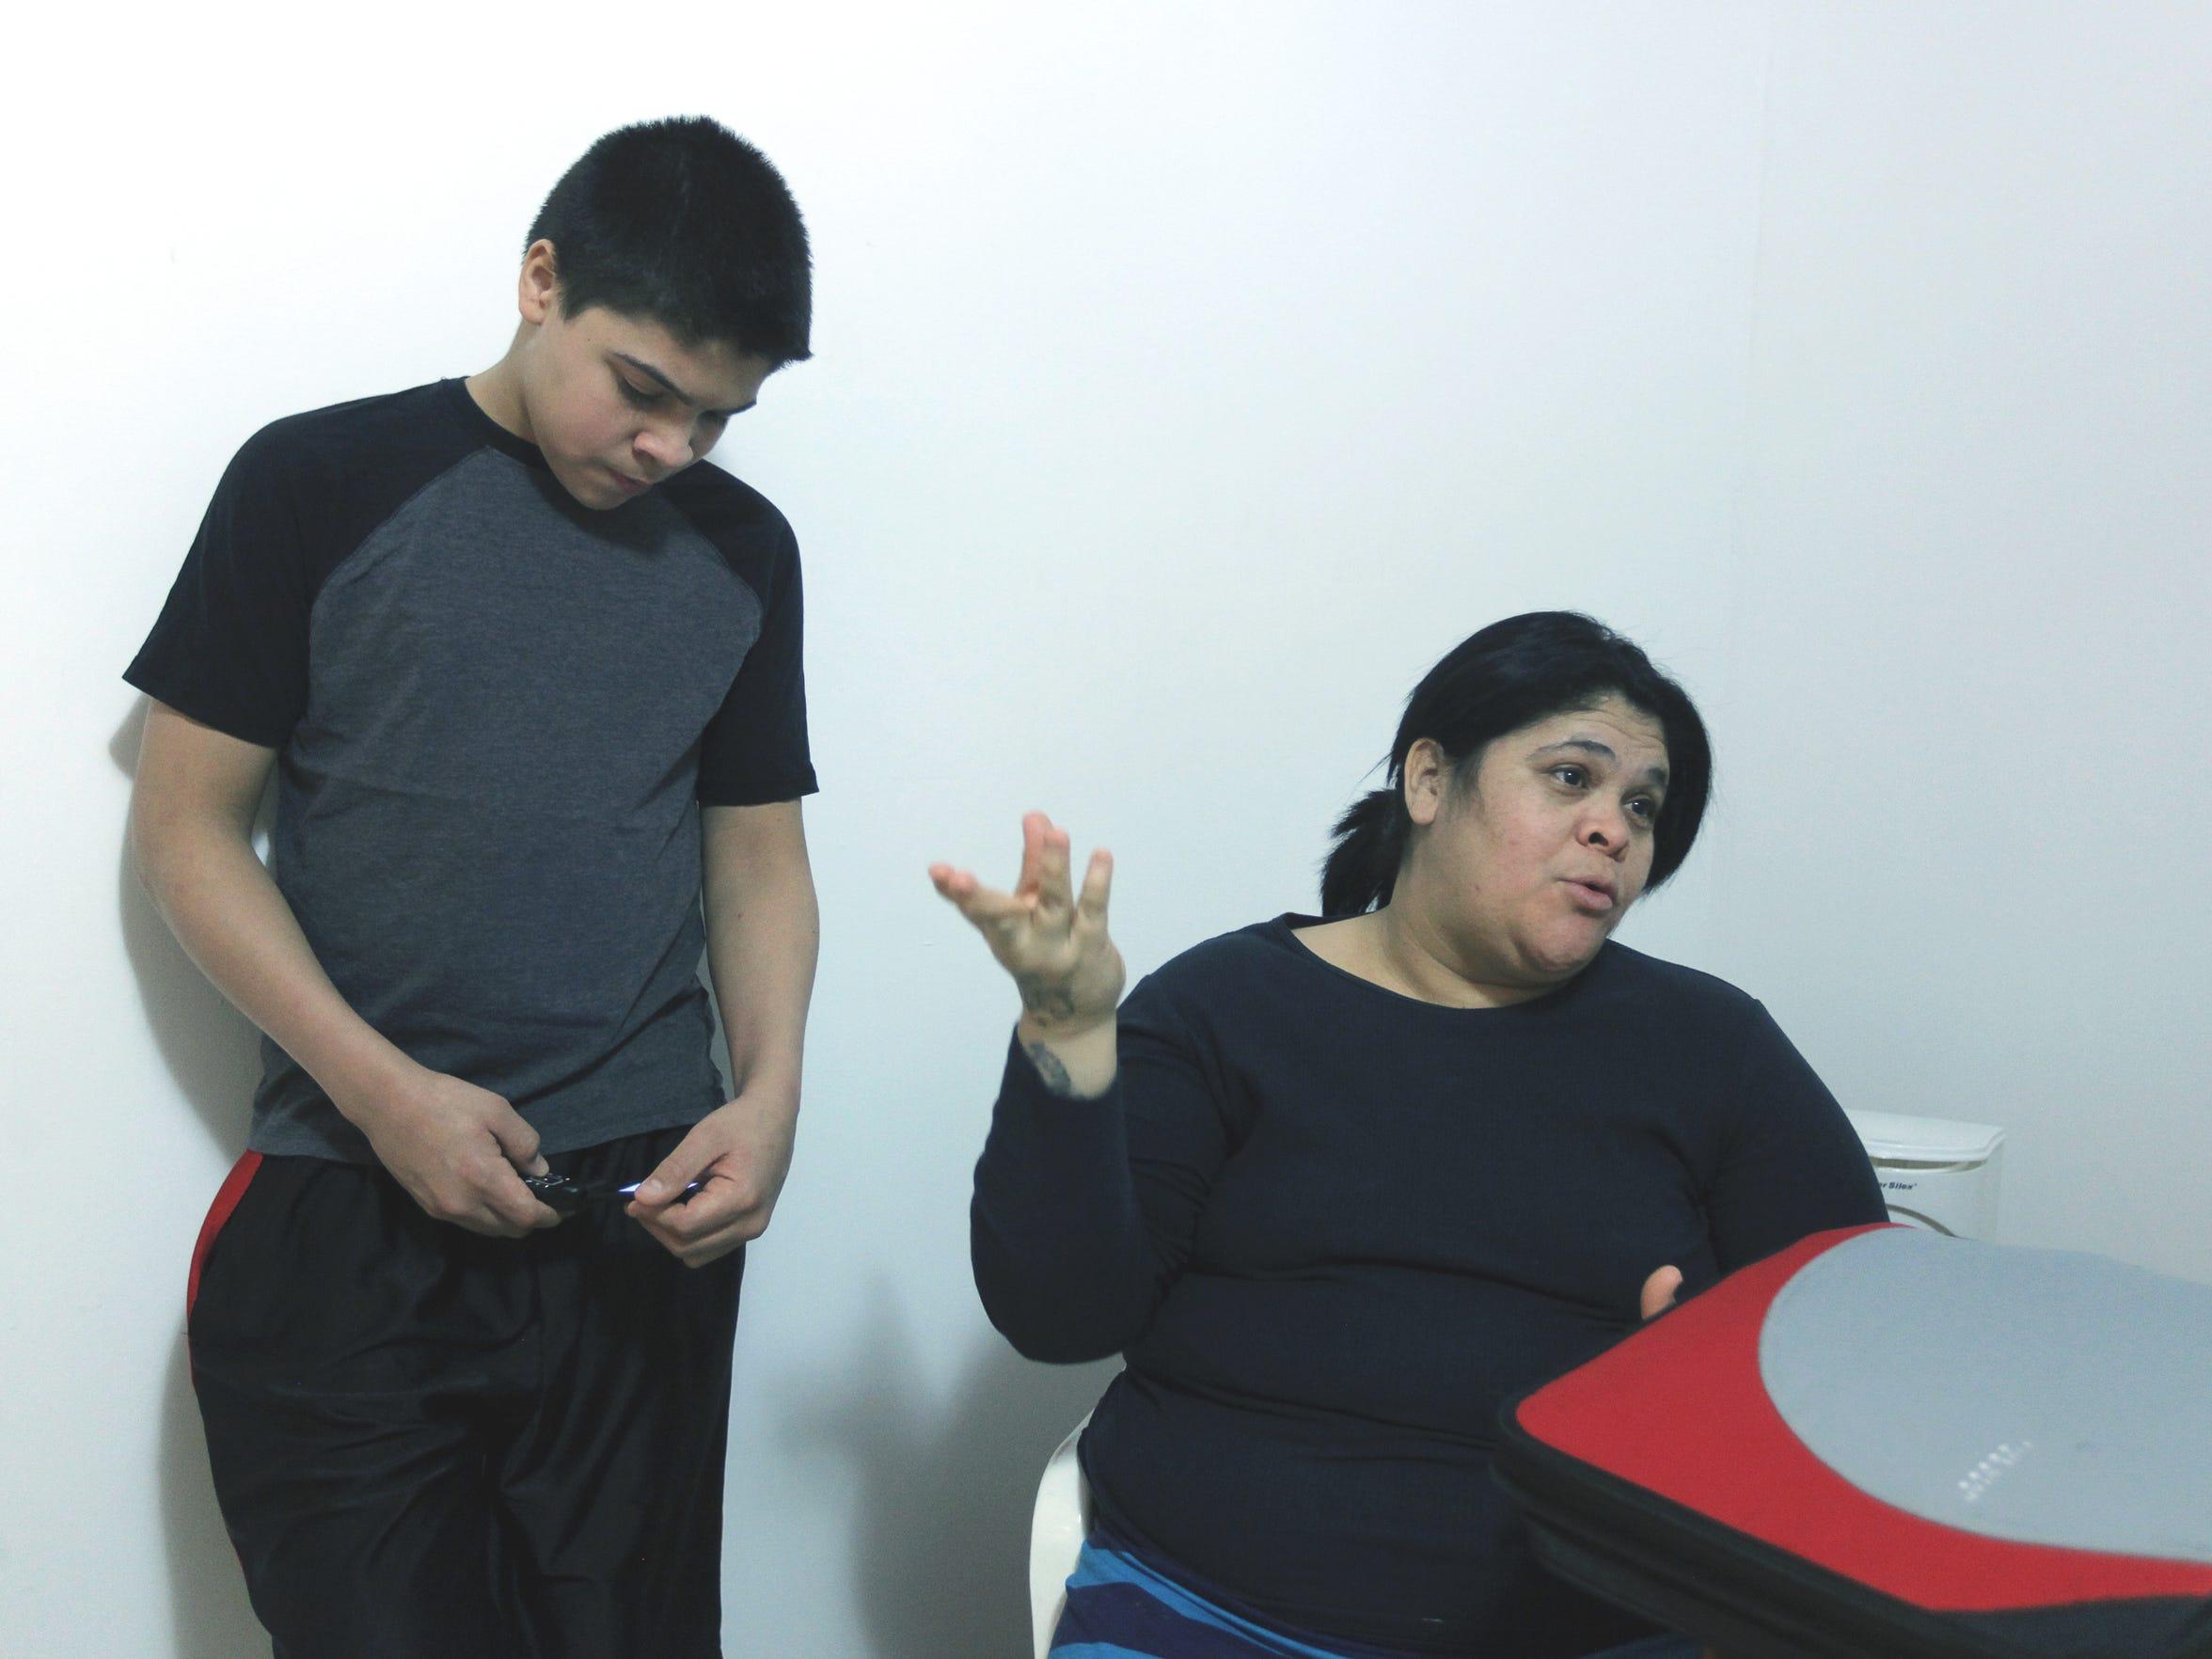 Juan Carlos Collado, 14, next to his mother, Yamitza